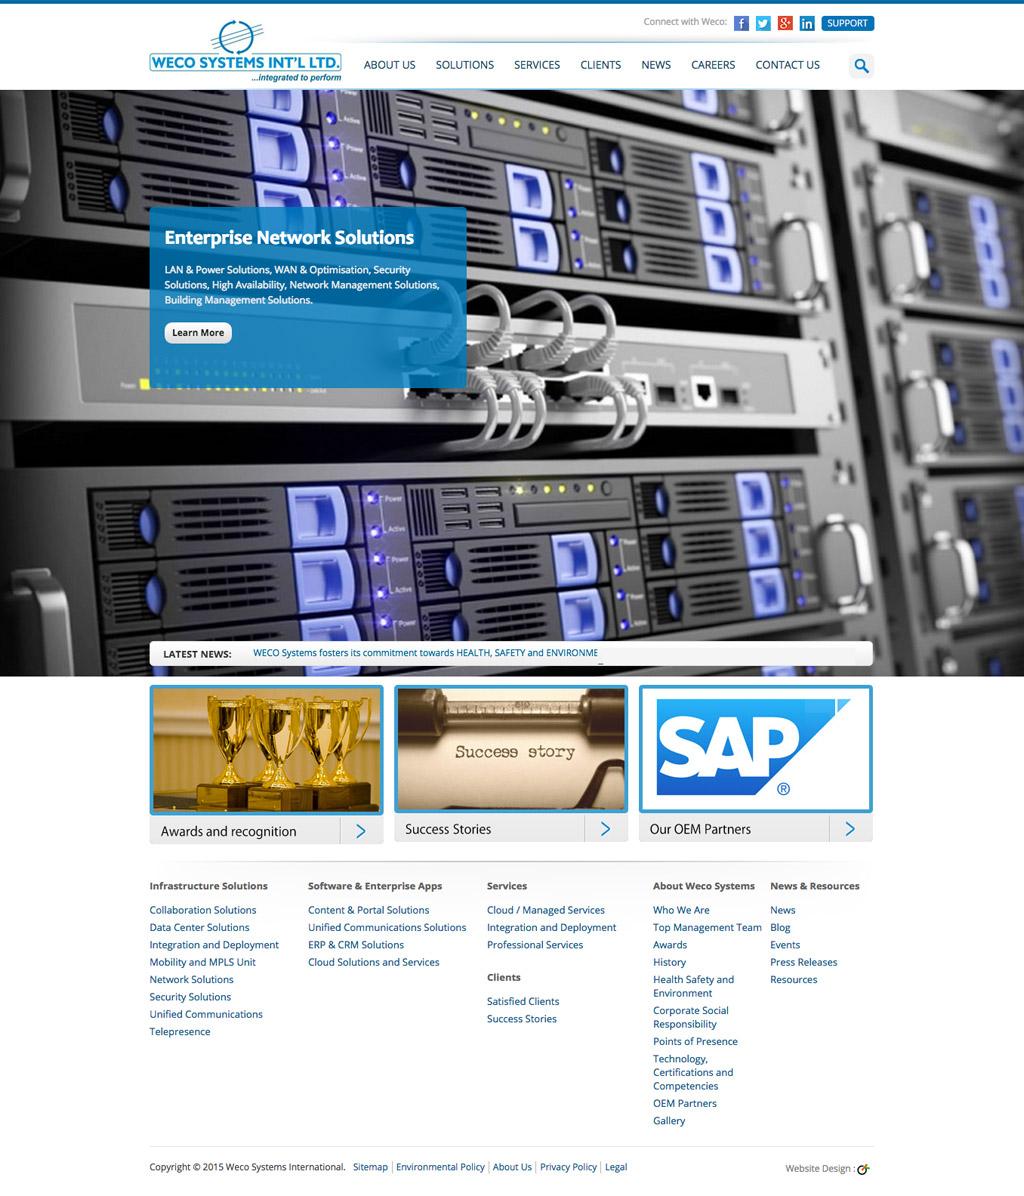 weco-systems-website-homepage-development